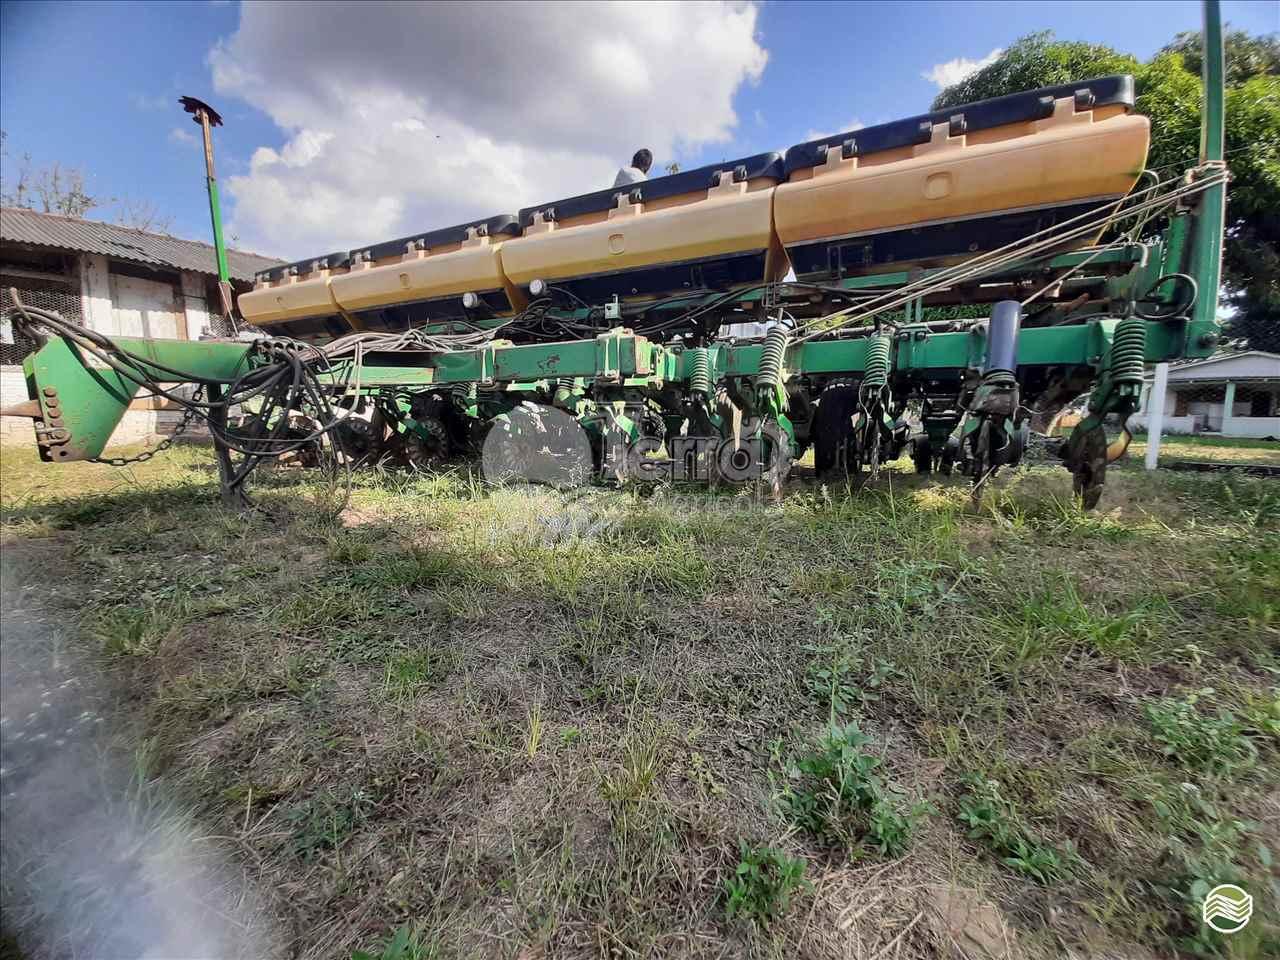 PLANTADEIRA JOHN DEERE PLANTADEIRAS 2117 Terra Agrícola DIAMANTINO MATO GROSSO MT